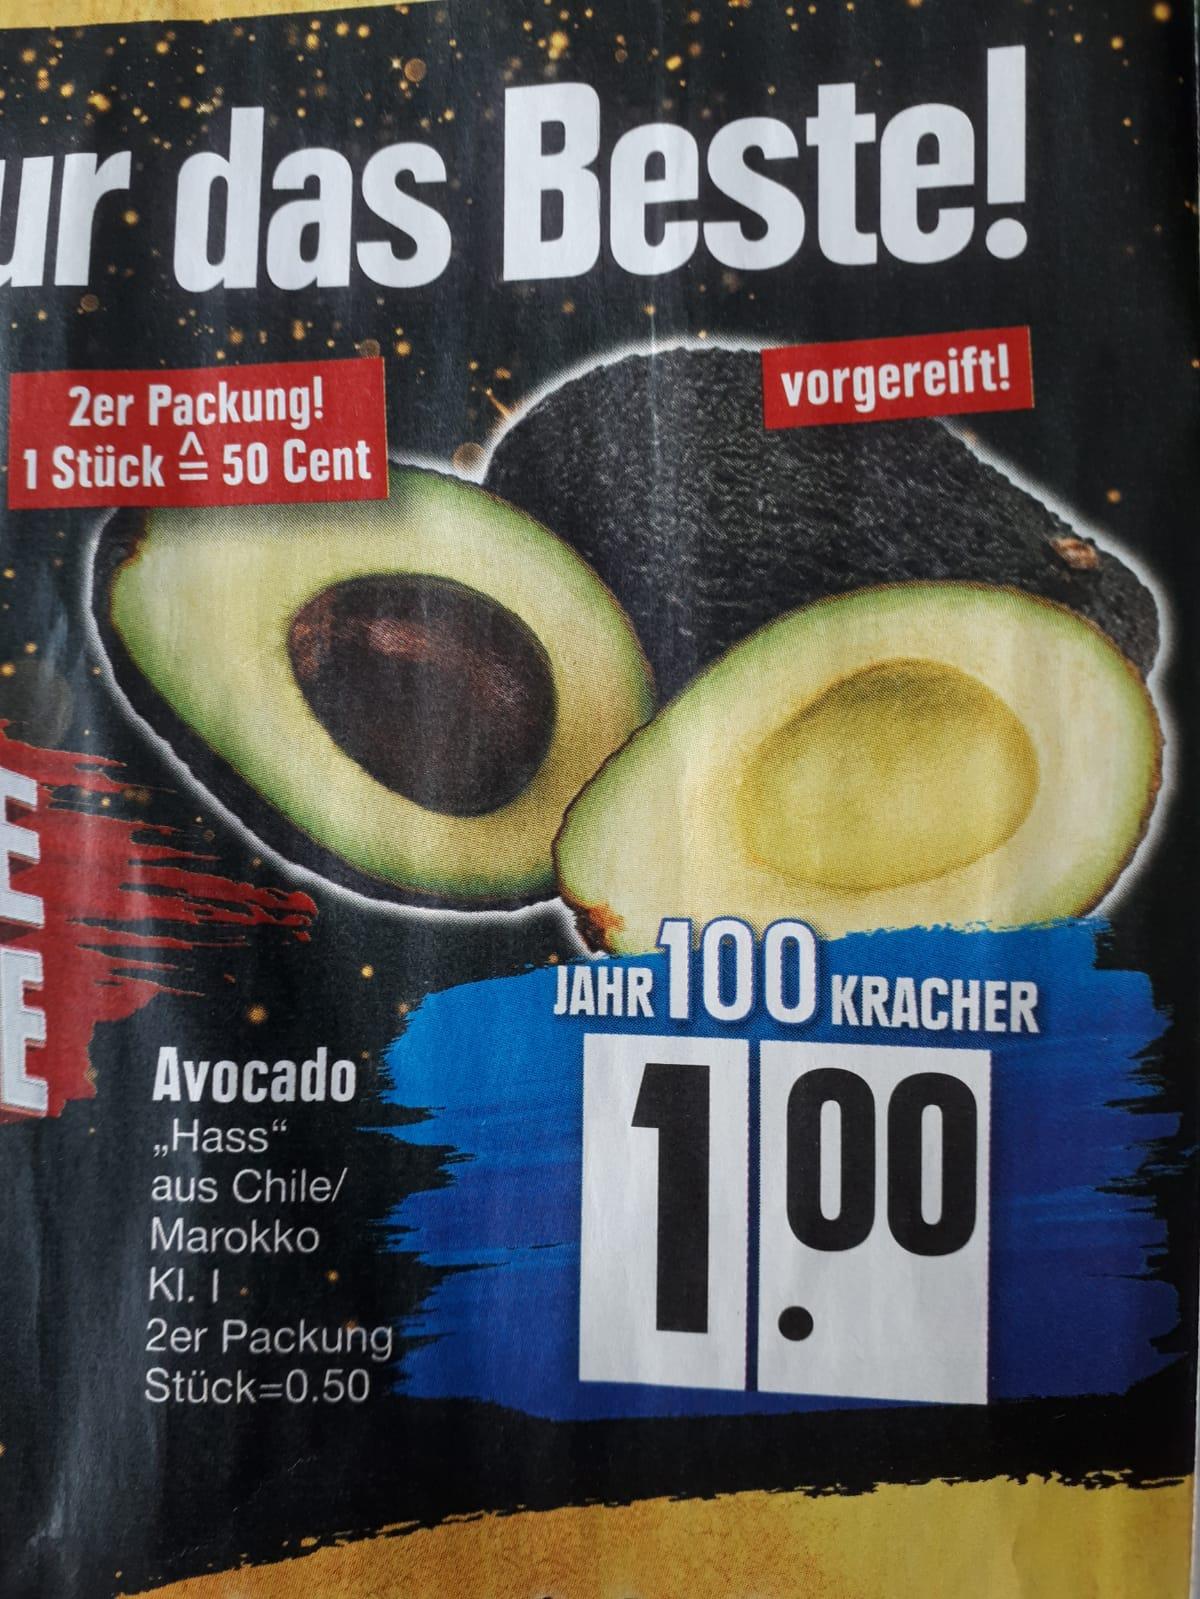 [Edeka Südbayern] 2 Stück(!) Avocado Kl. 1 vorgereift